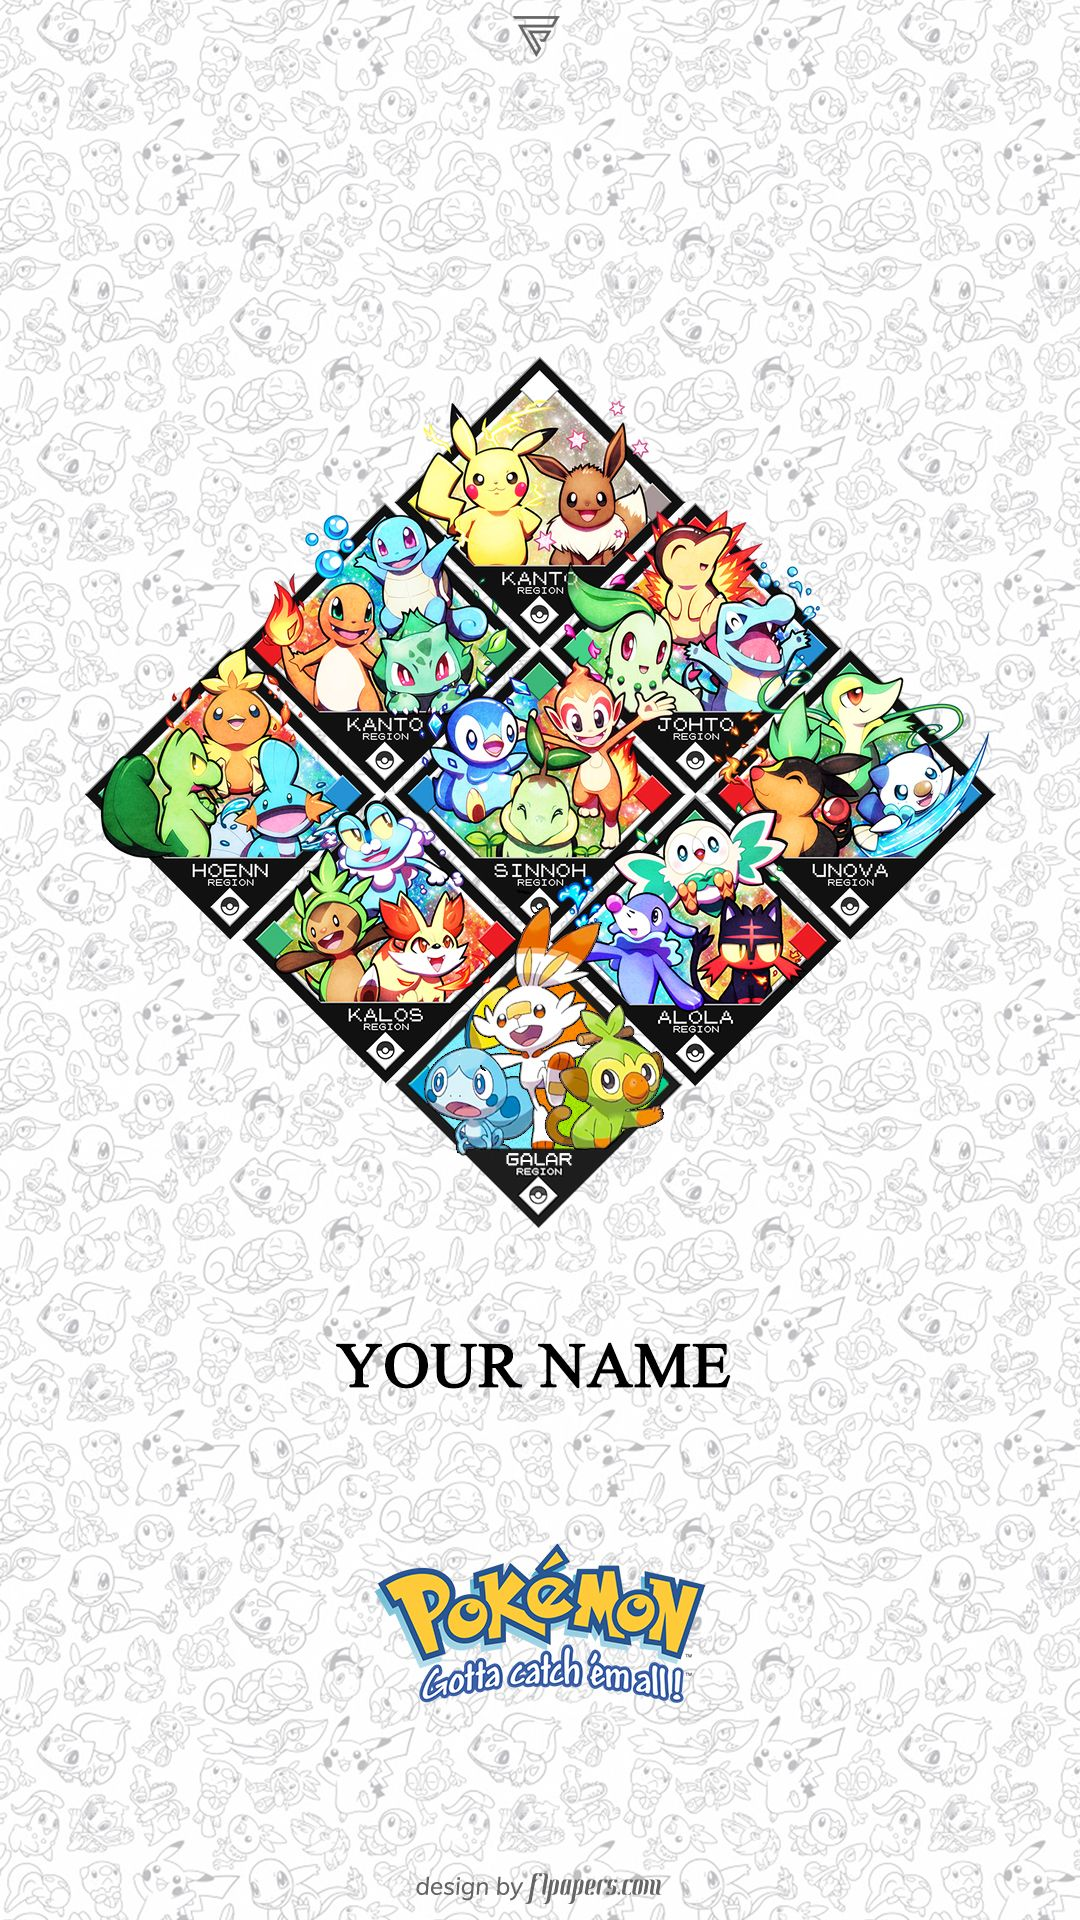 Pokemon Starters Wallpaper : pokemon, starters, wallpaper, Pokemon, Starters, Wallpaper, Starters,, Pokemon,, Pikachu, Iphone